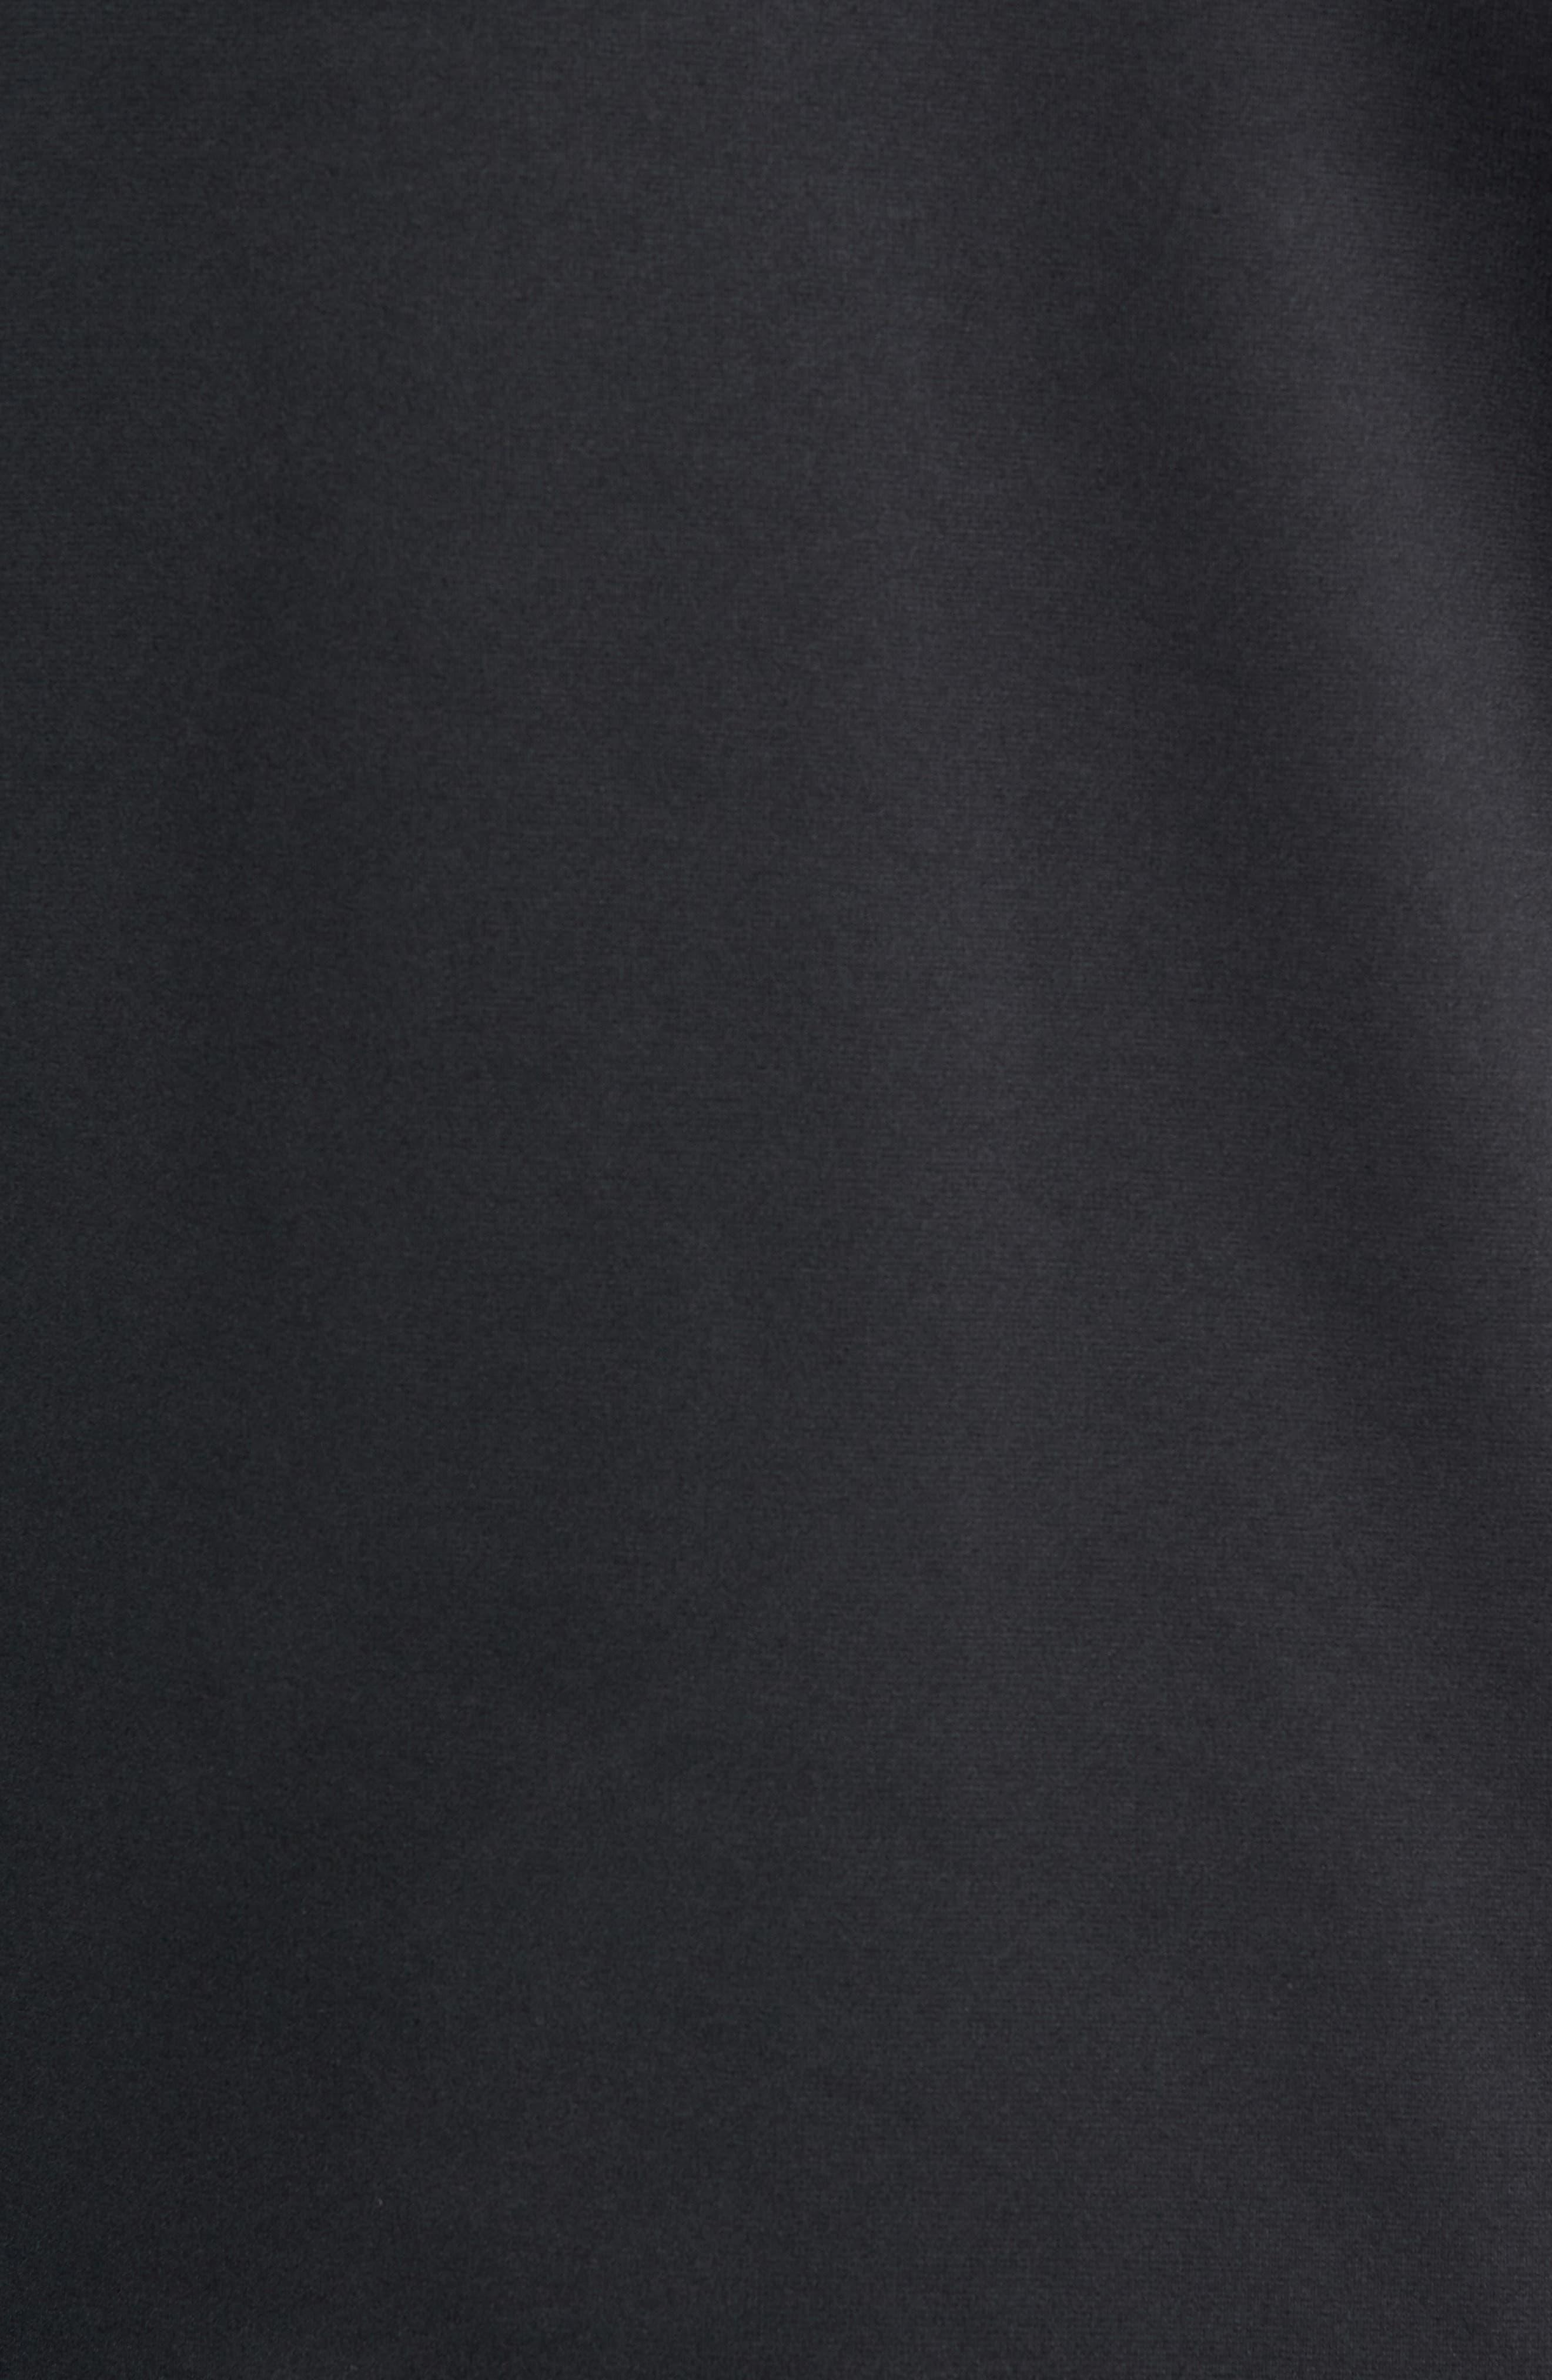 Quarter Zip Pullover,                             Alternate thumbnail 5, color,                             BLACK/ DARK GREY